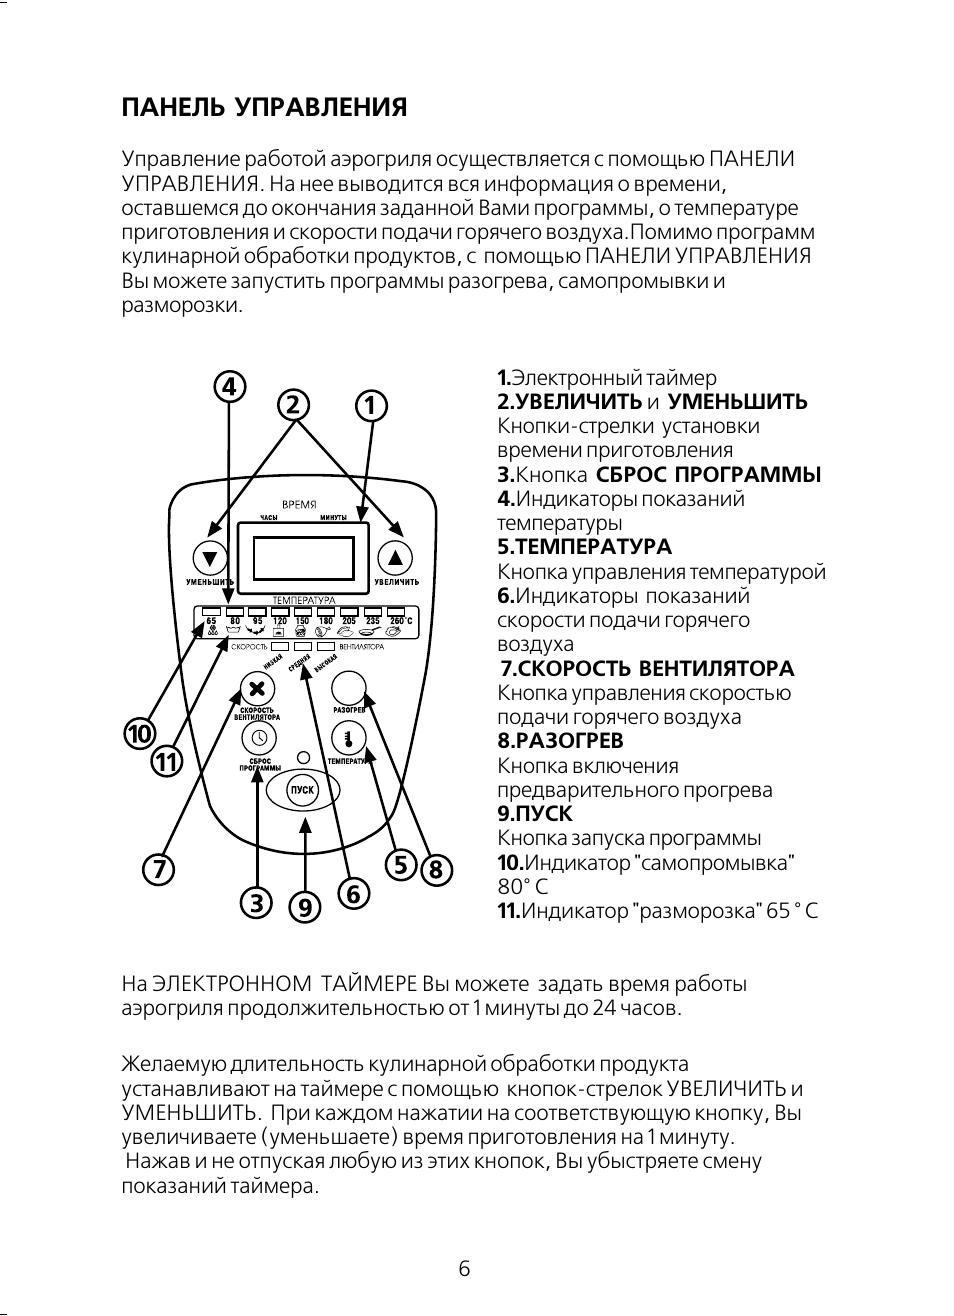 инструкция аэрогриль hotter hx 1057